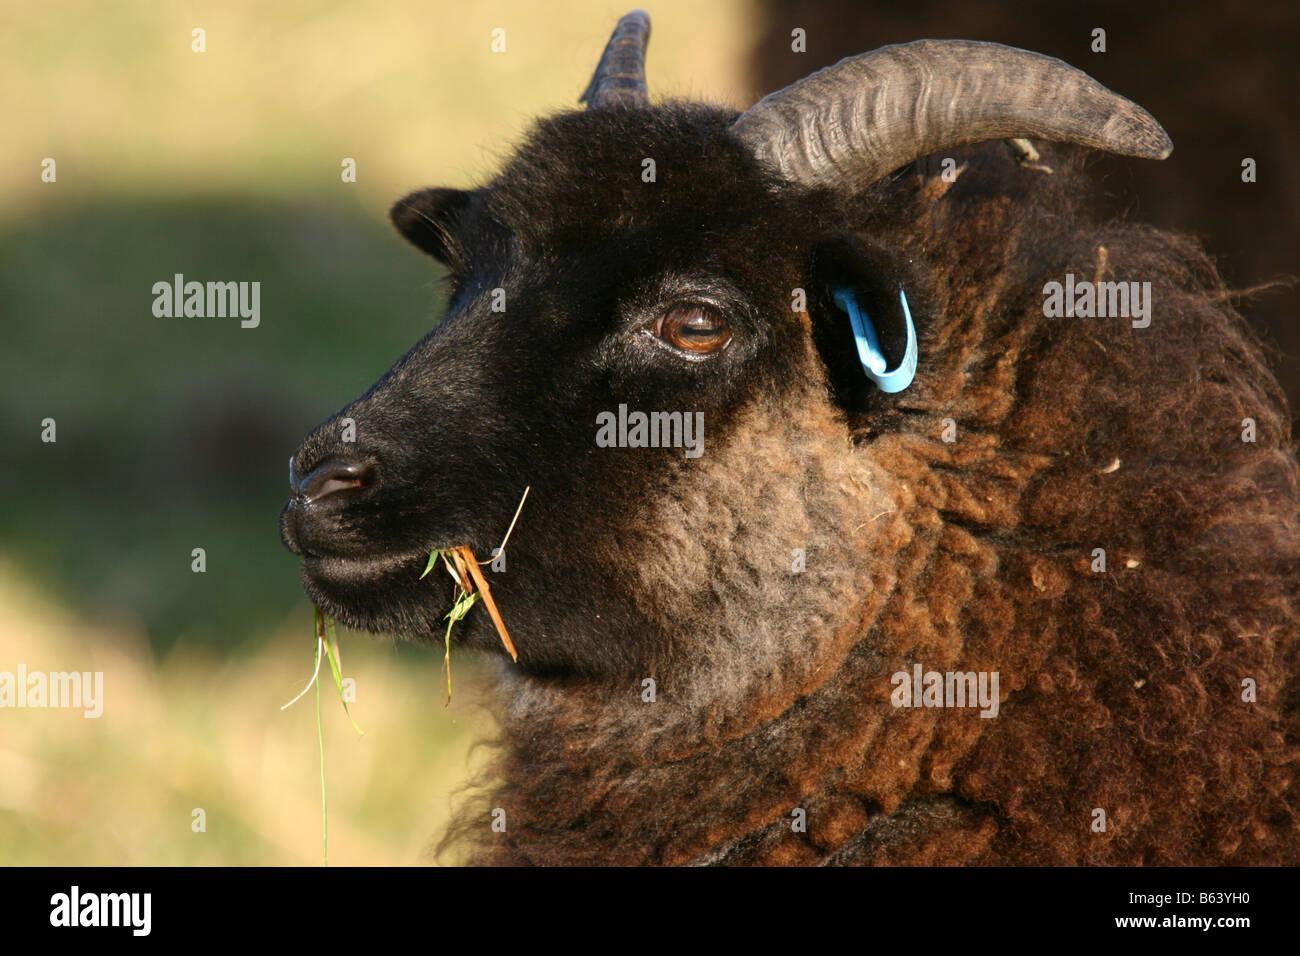 HEBRIDEAN sheep grazing nottinghamshire wildlife trust reserve - Stock Image